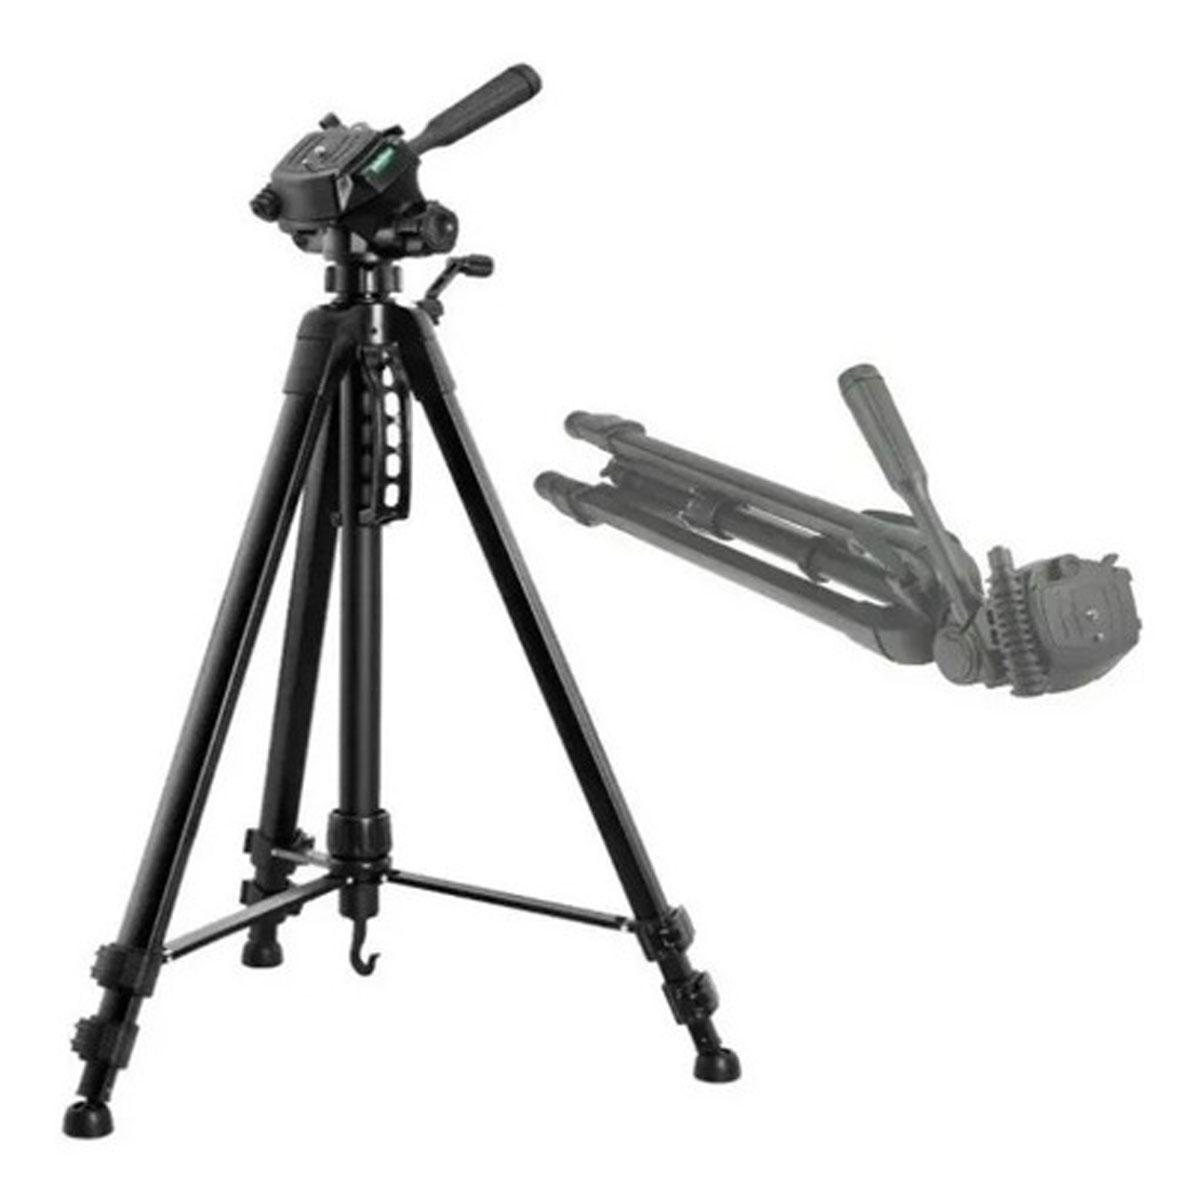 Tripode Profesional 170cm Manija +estuche Adaptador Celular